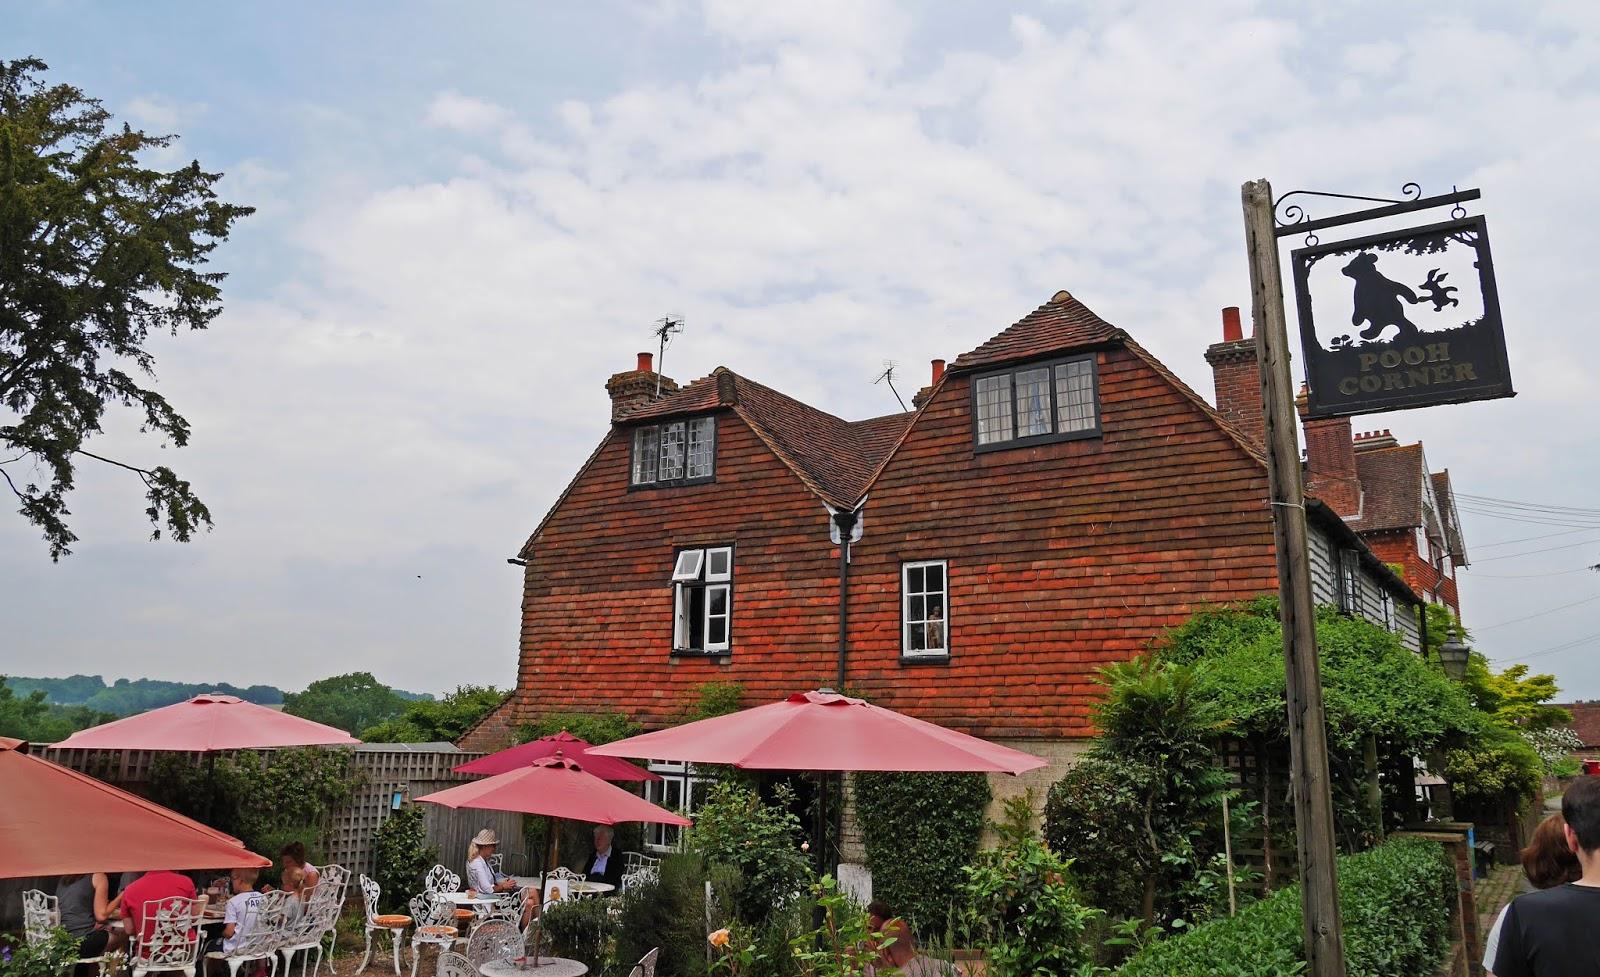 Piglet's Tearoom at Pooh Corner, Hartfield